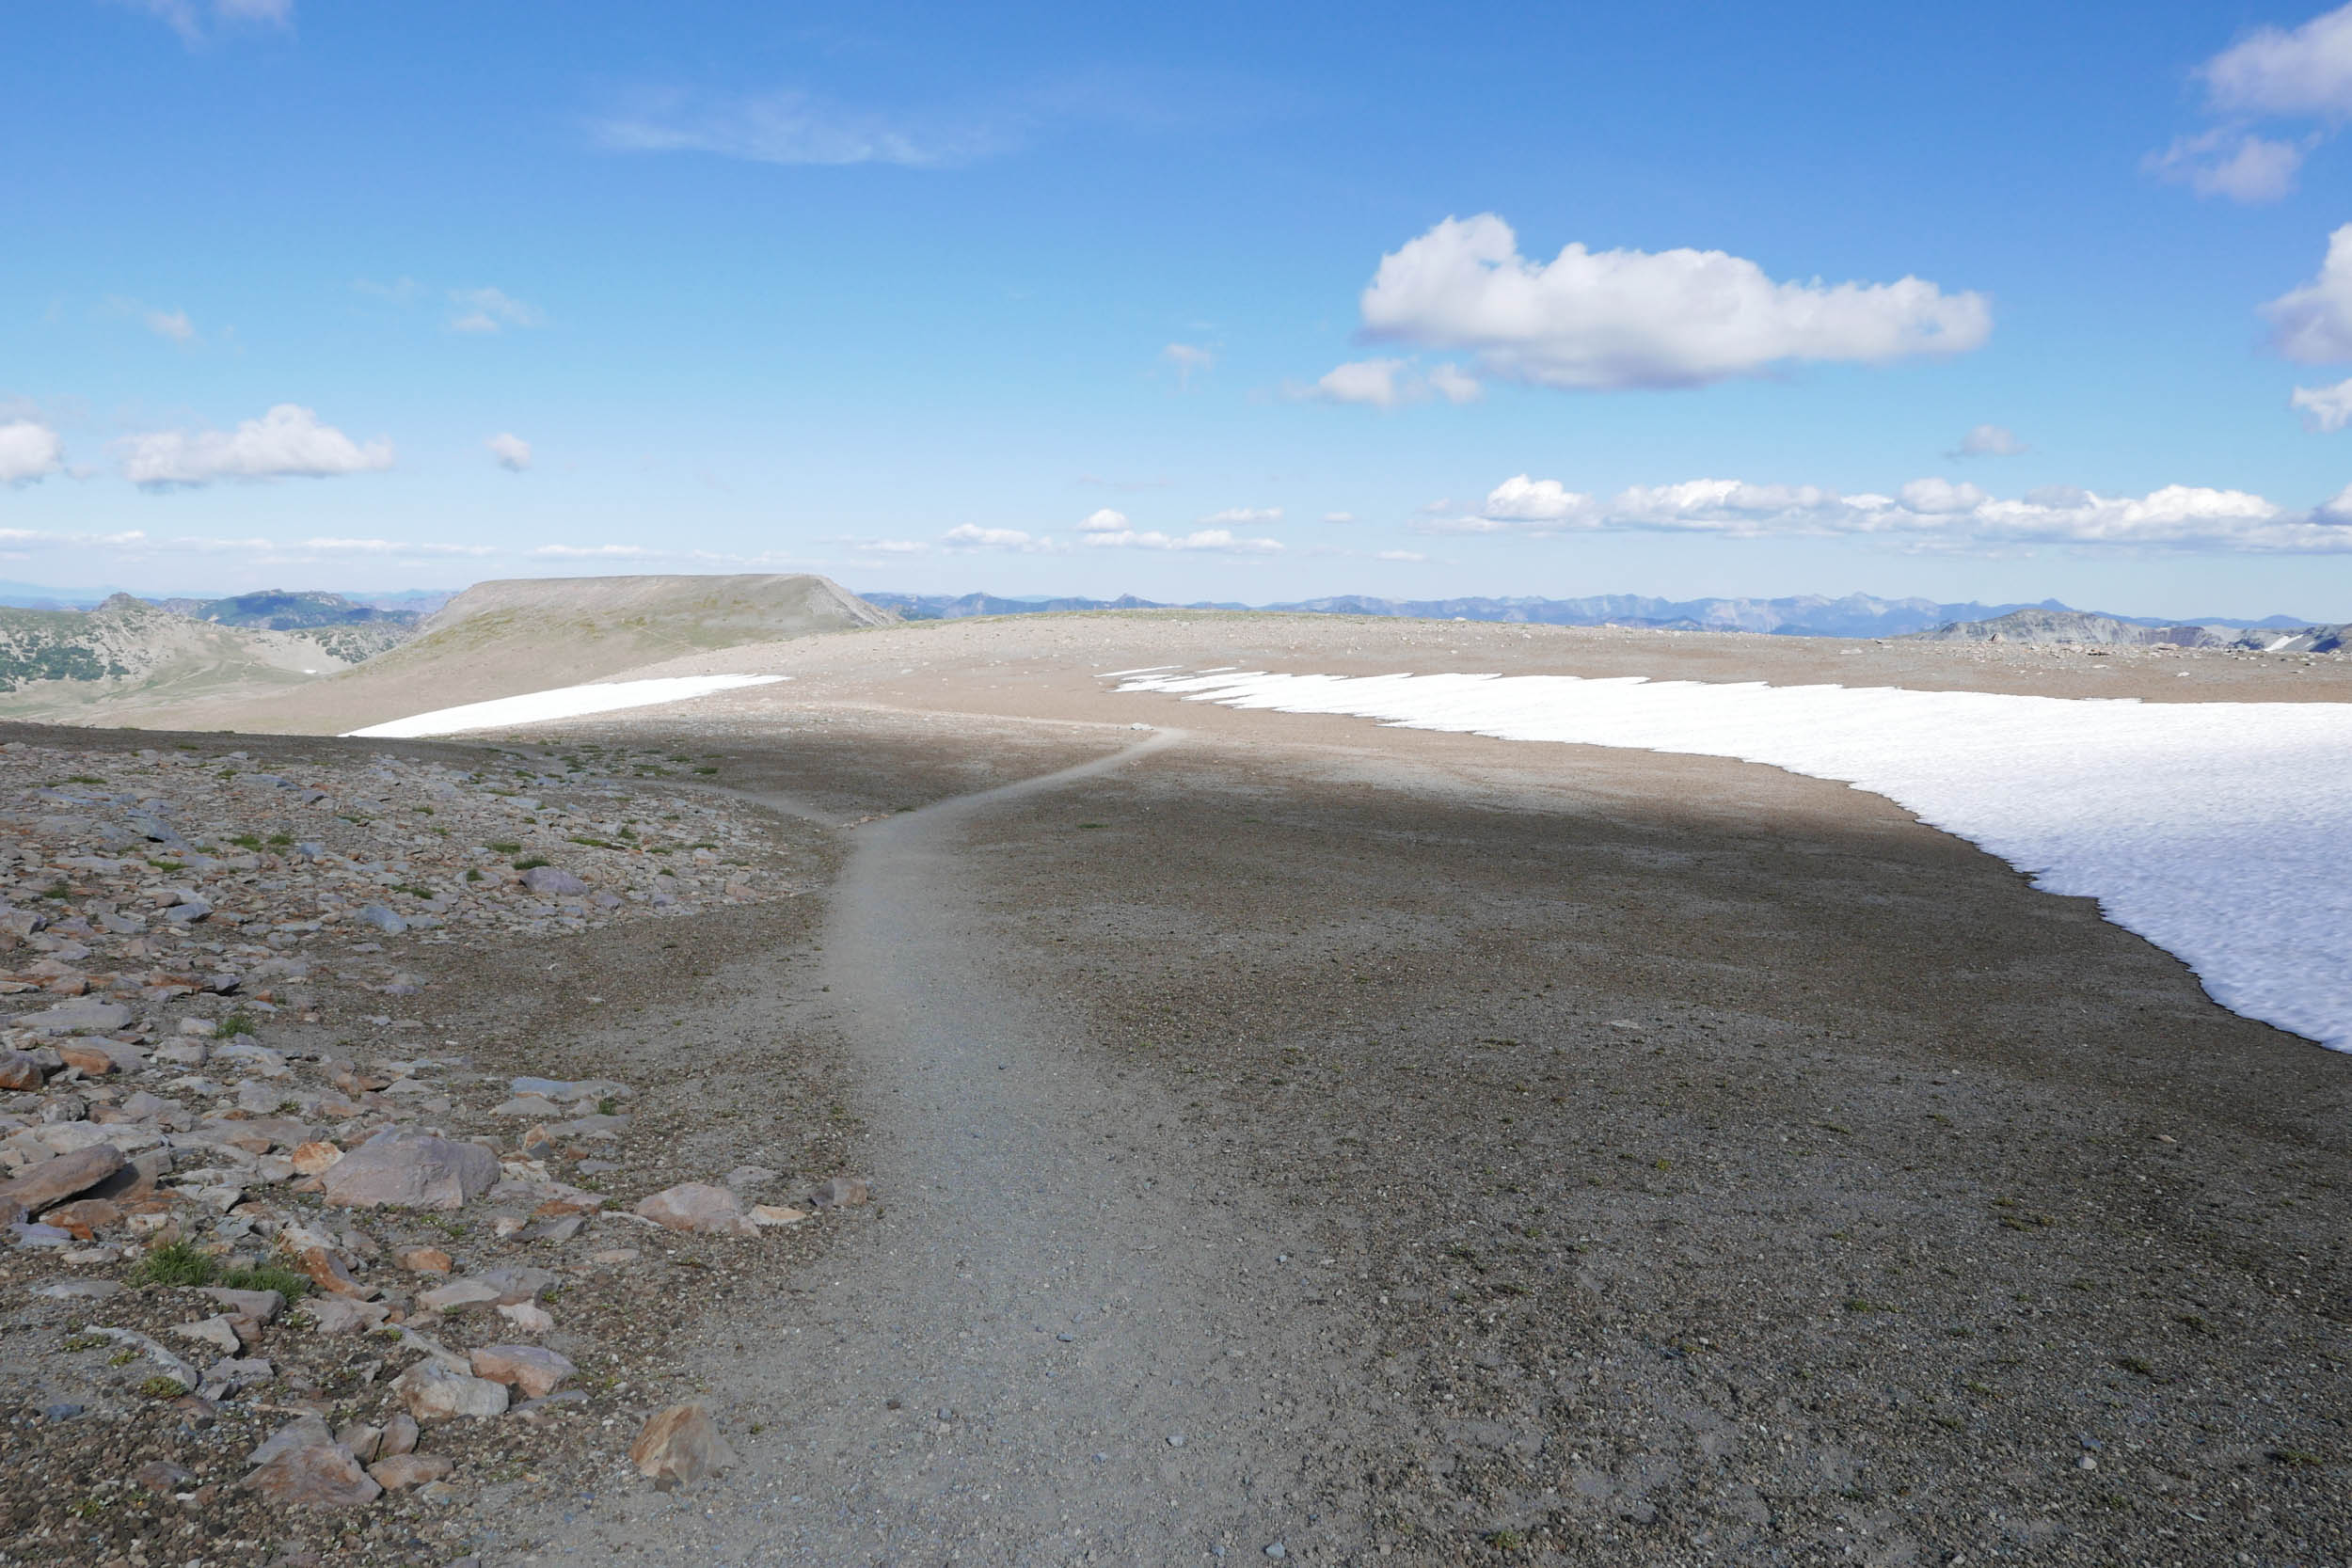 Third tundralands